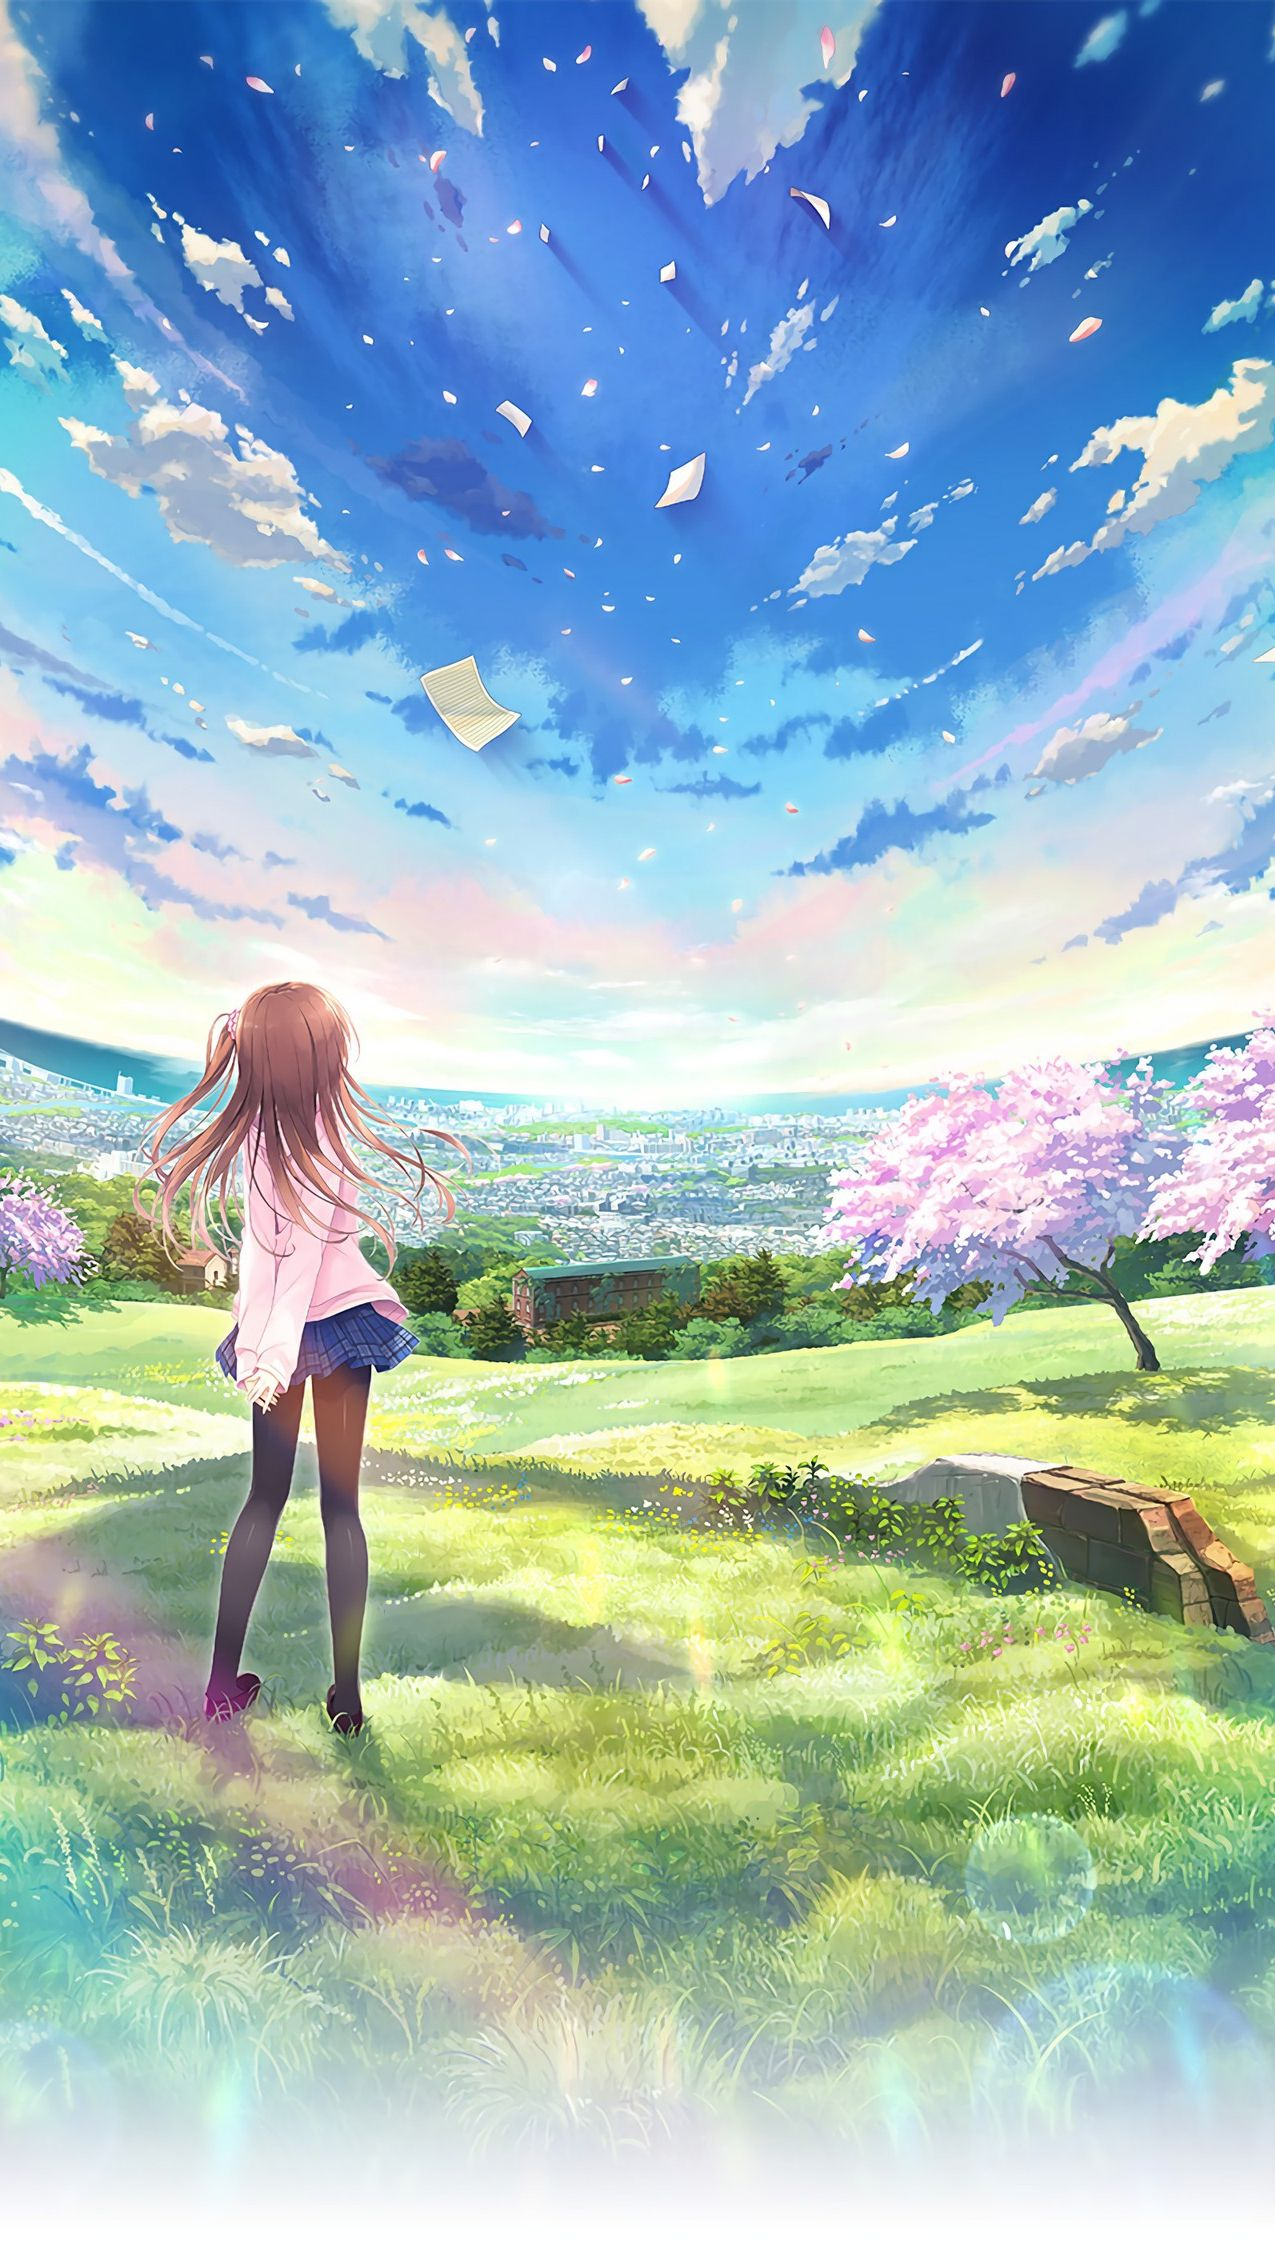 Anime World Beautiful Girl Sky Iphone Wallpaper Anime Scenery